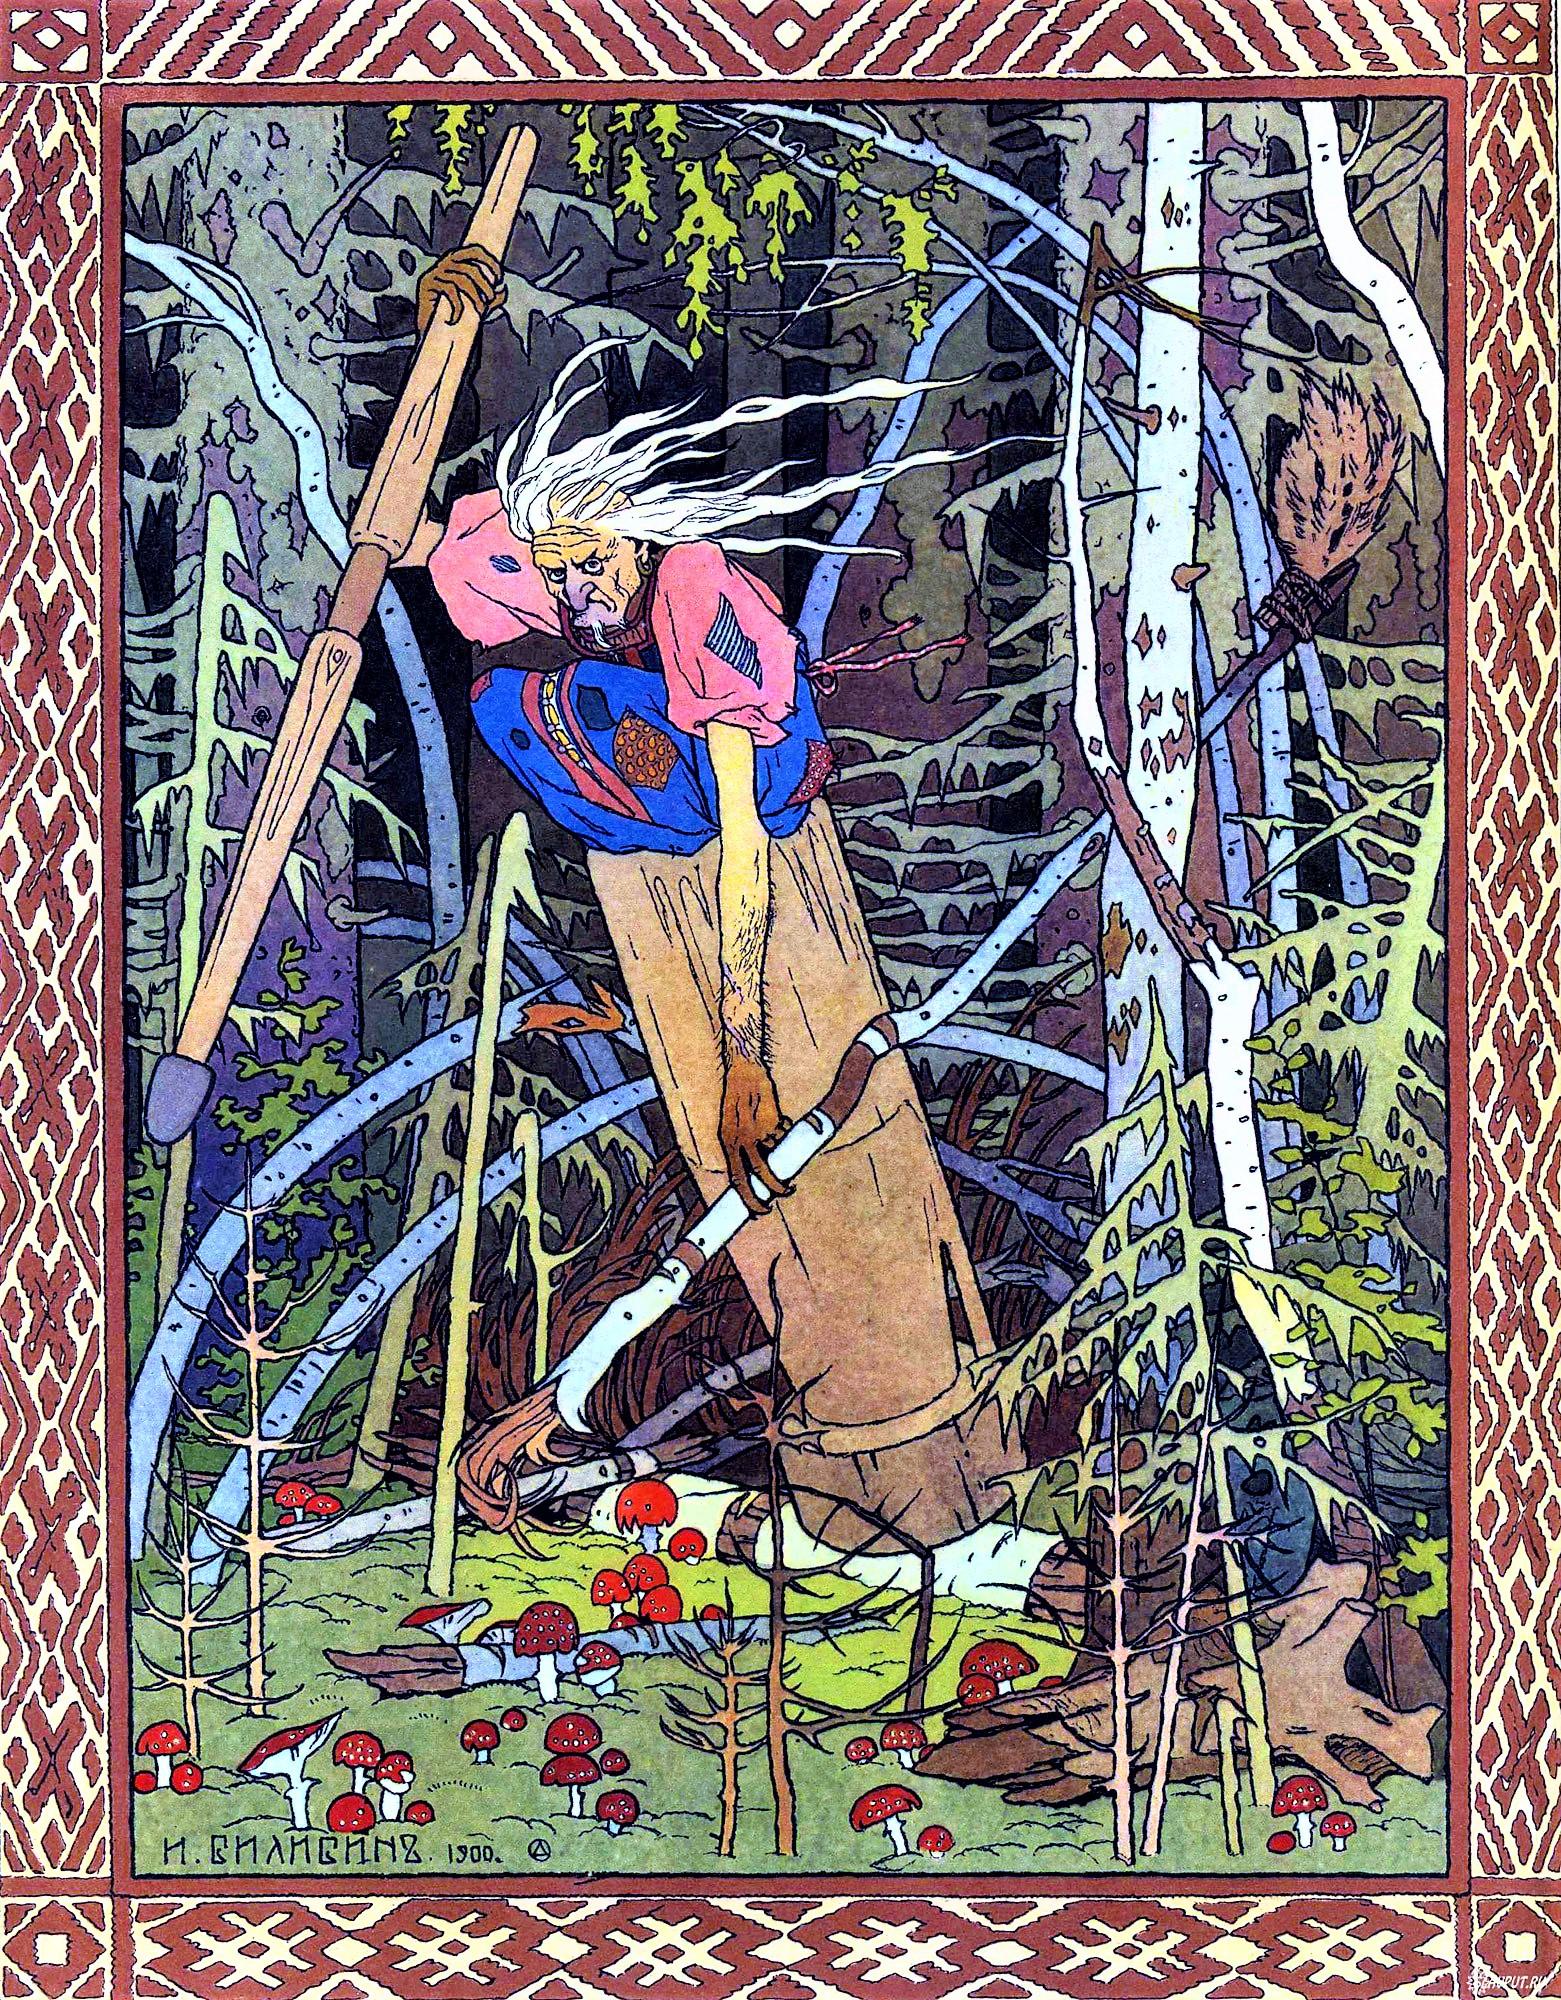 Baba Yaga crashing through the forest